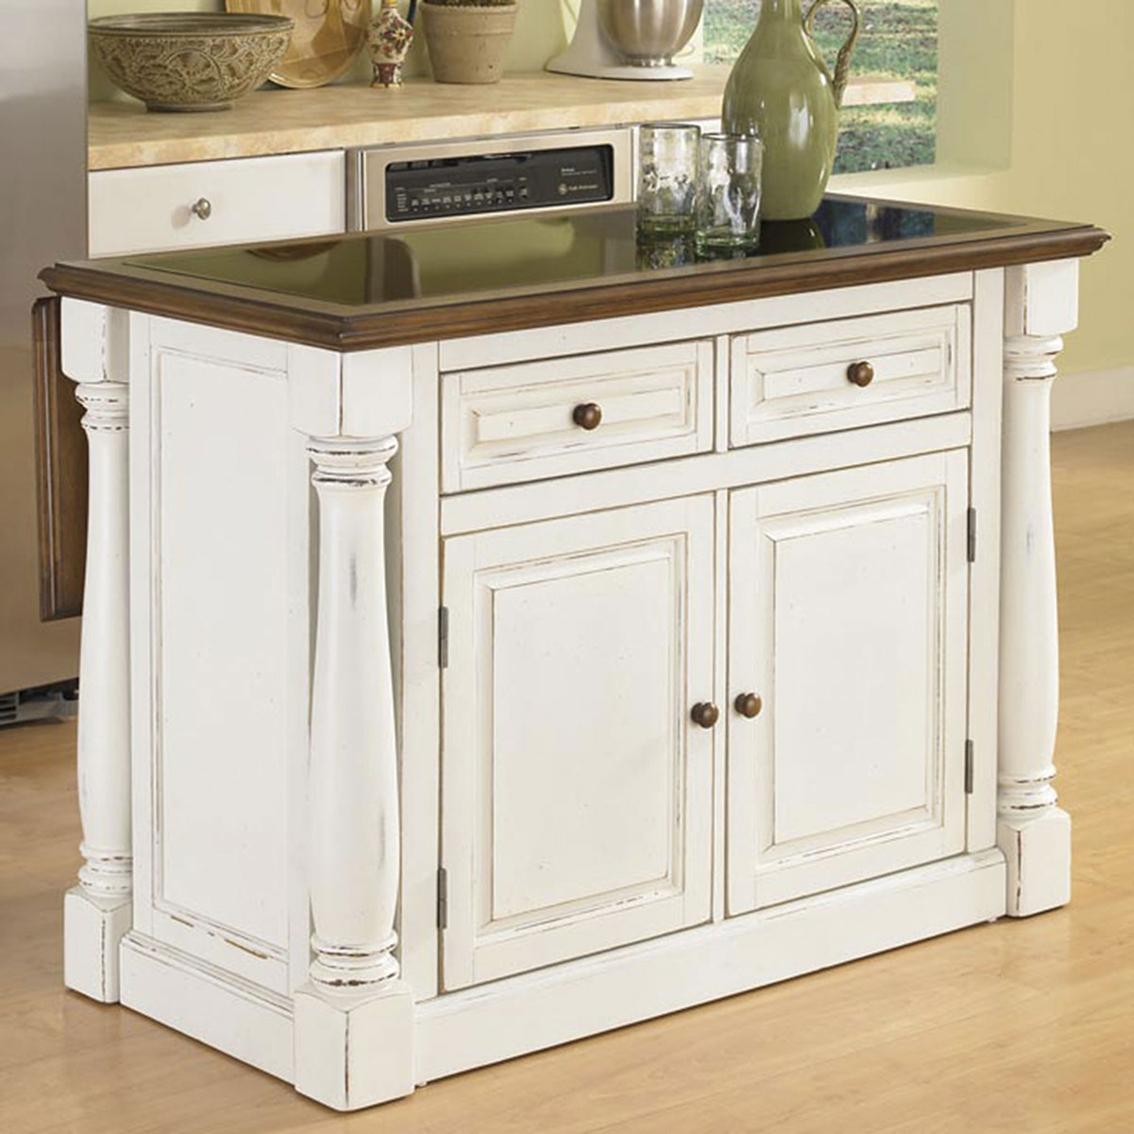 monarch kitchen island decor for home styles with black granite